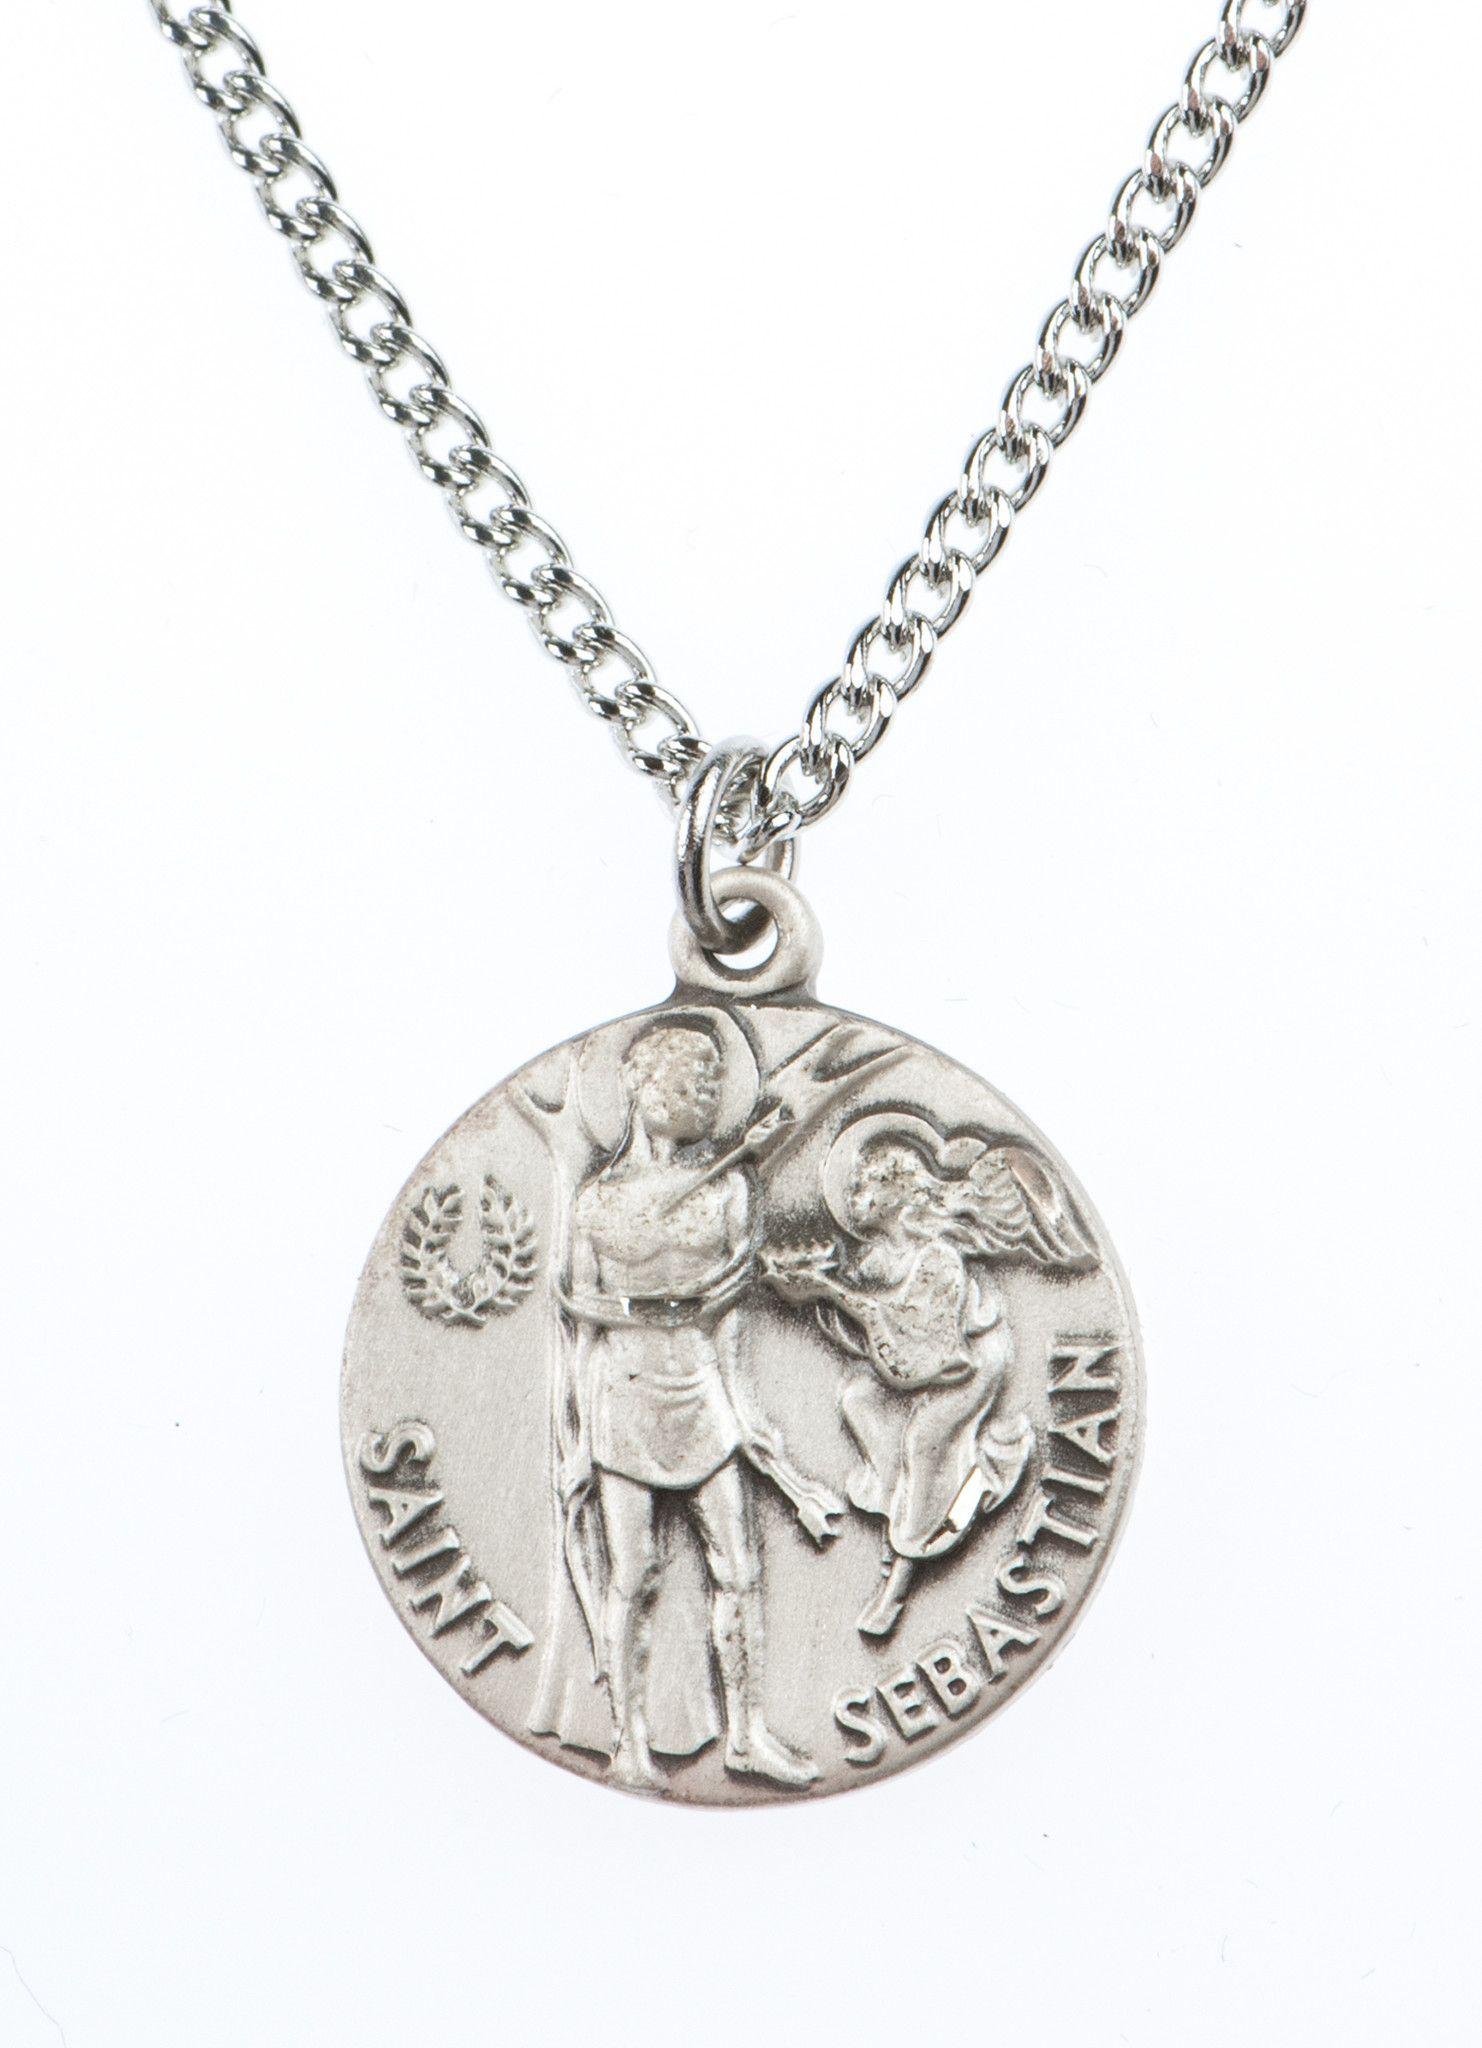 St sebastian saint medal pendant w18 chain by jeweled cross st sebastian saint medal pendant w18 chain by jeweled cross aloadofball Images